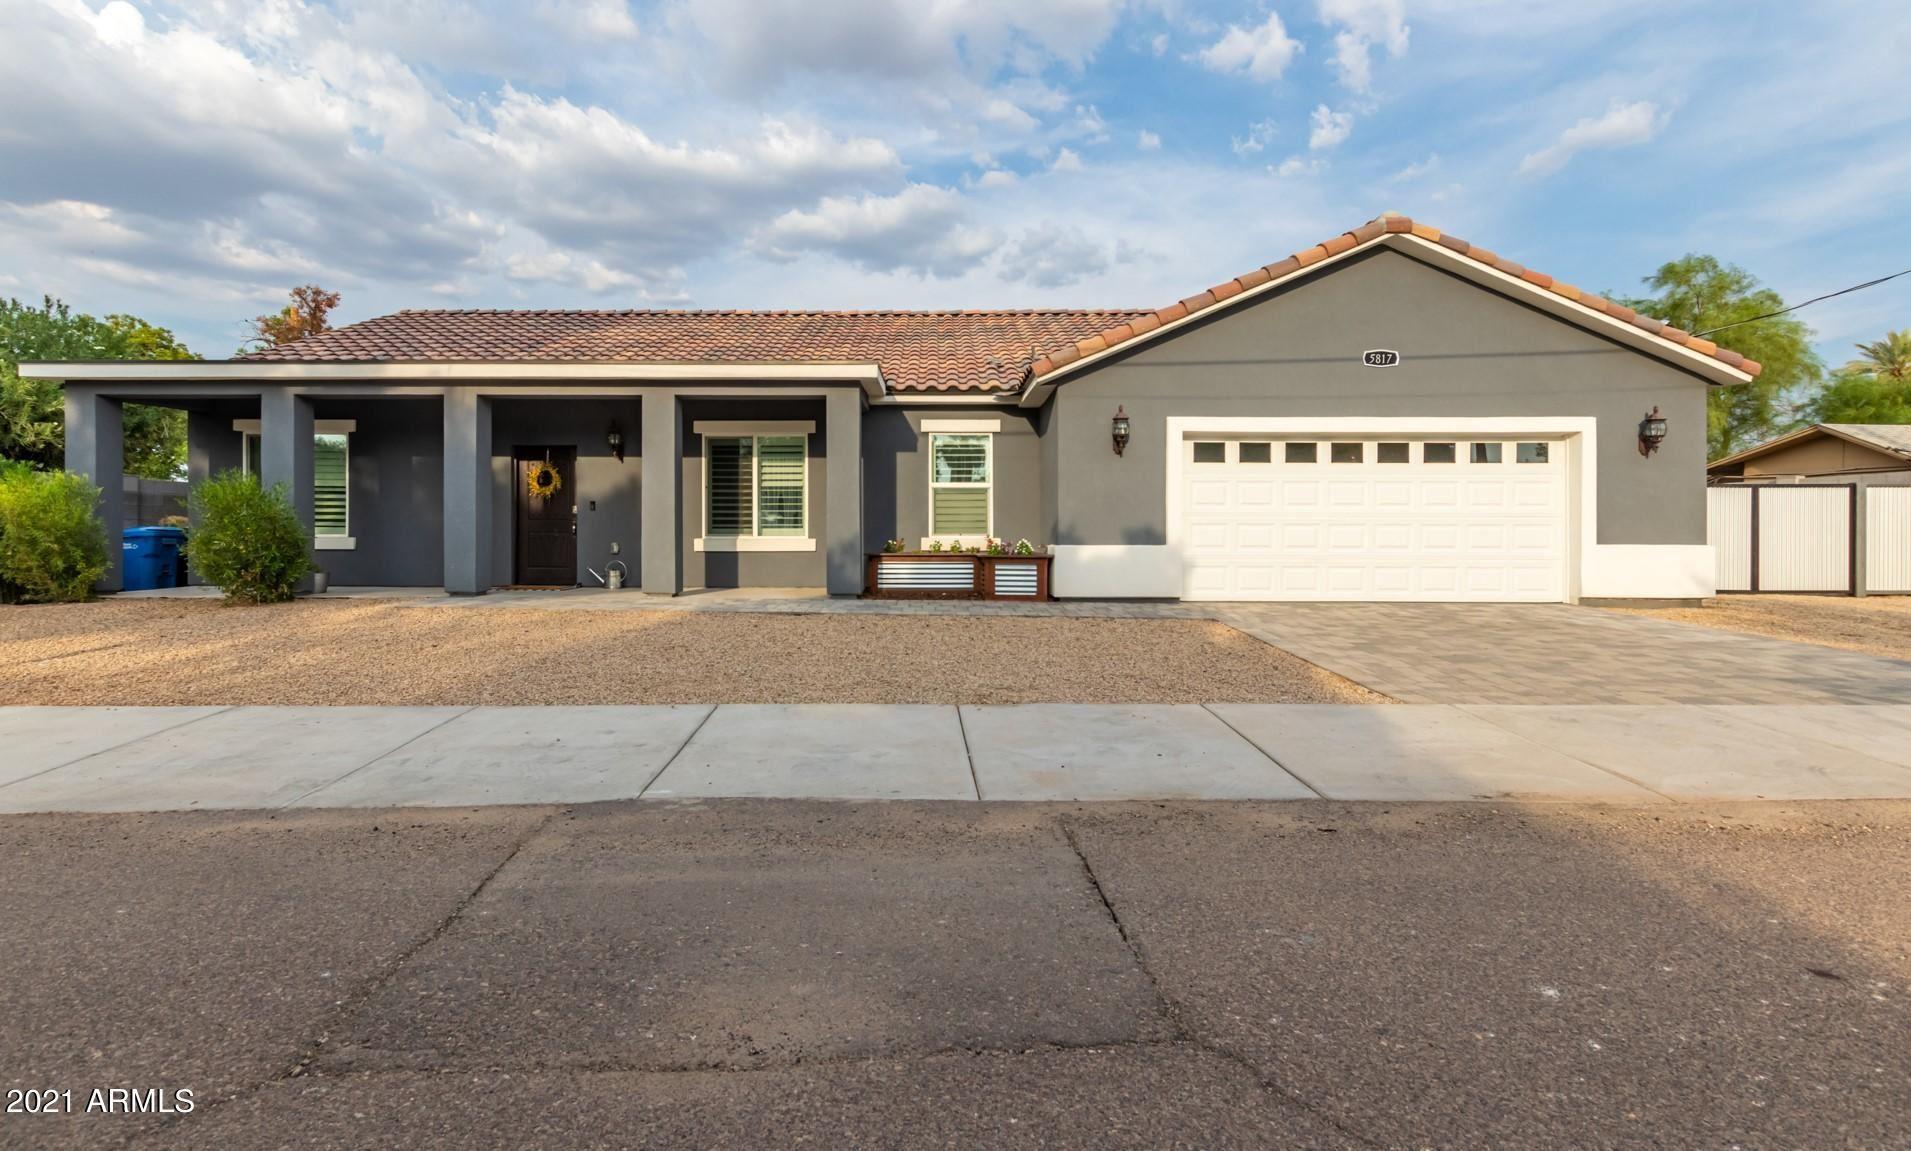 5817 S 27TH Place, Phoenix, AZ 85040 - MLS#: 6266976